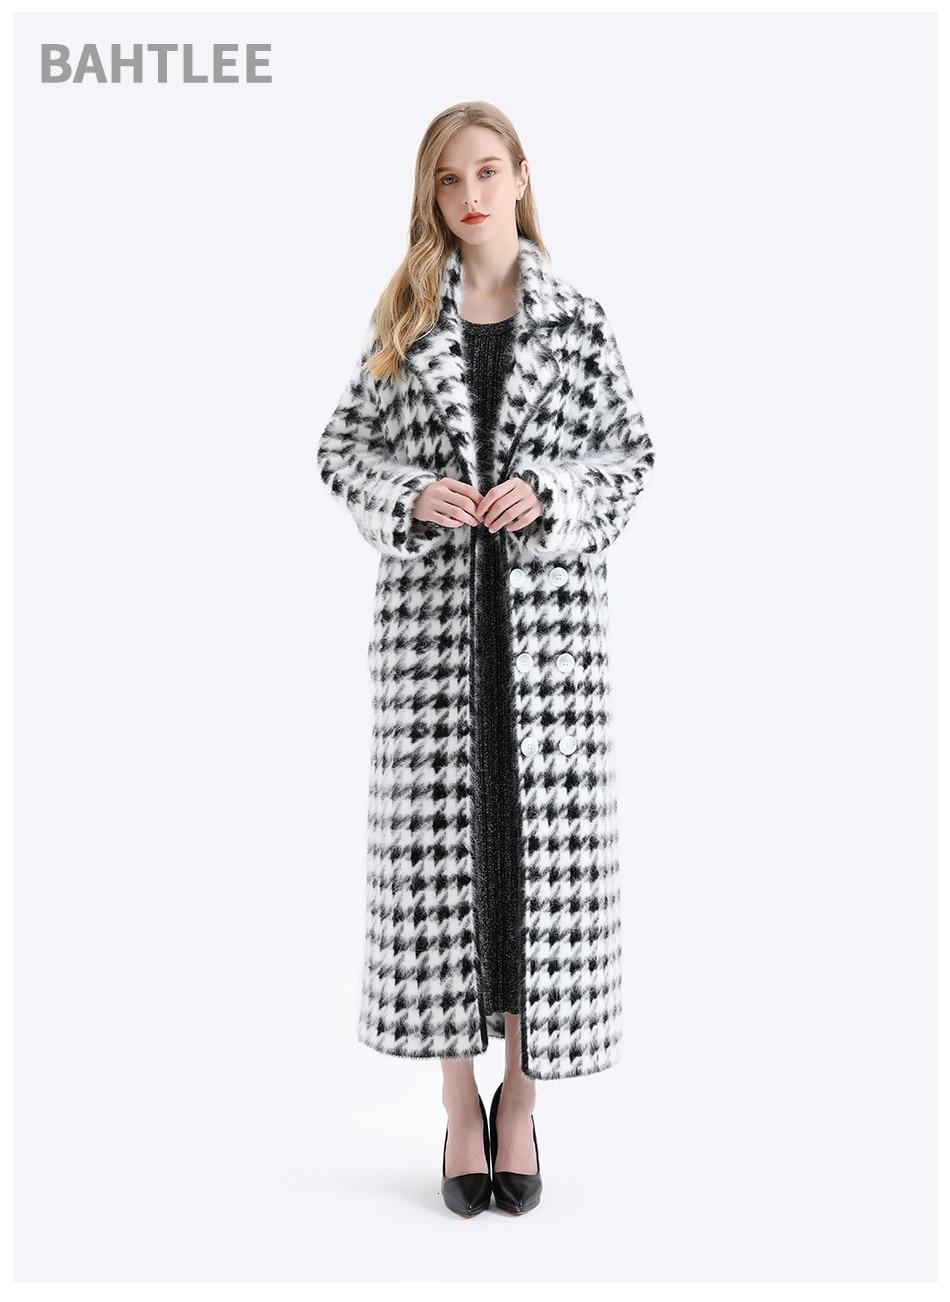 BAHTLEE Women Angora Long Coat Houndstooth Pattern Sweater Winter Wool Knitted Cardigans Jumper Turn Down Collar Long Sleeves 6